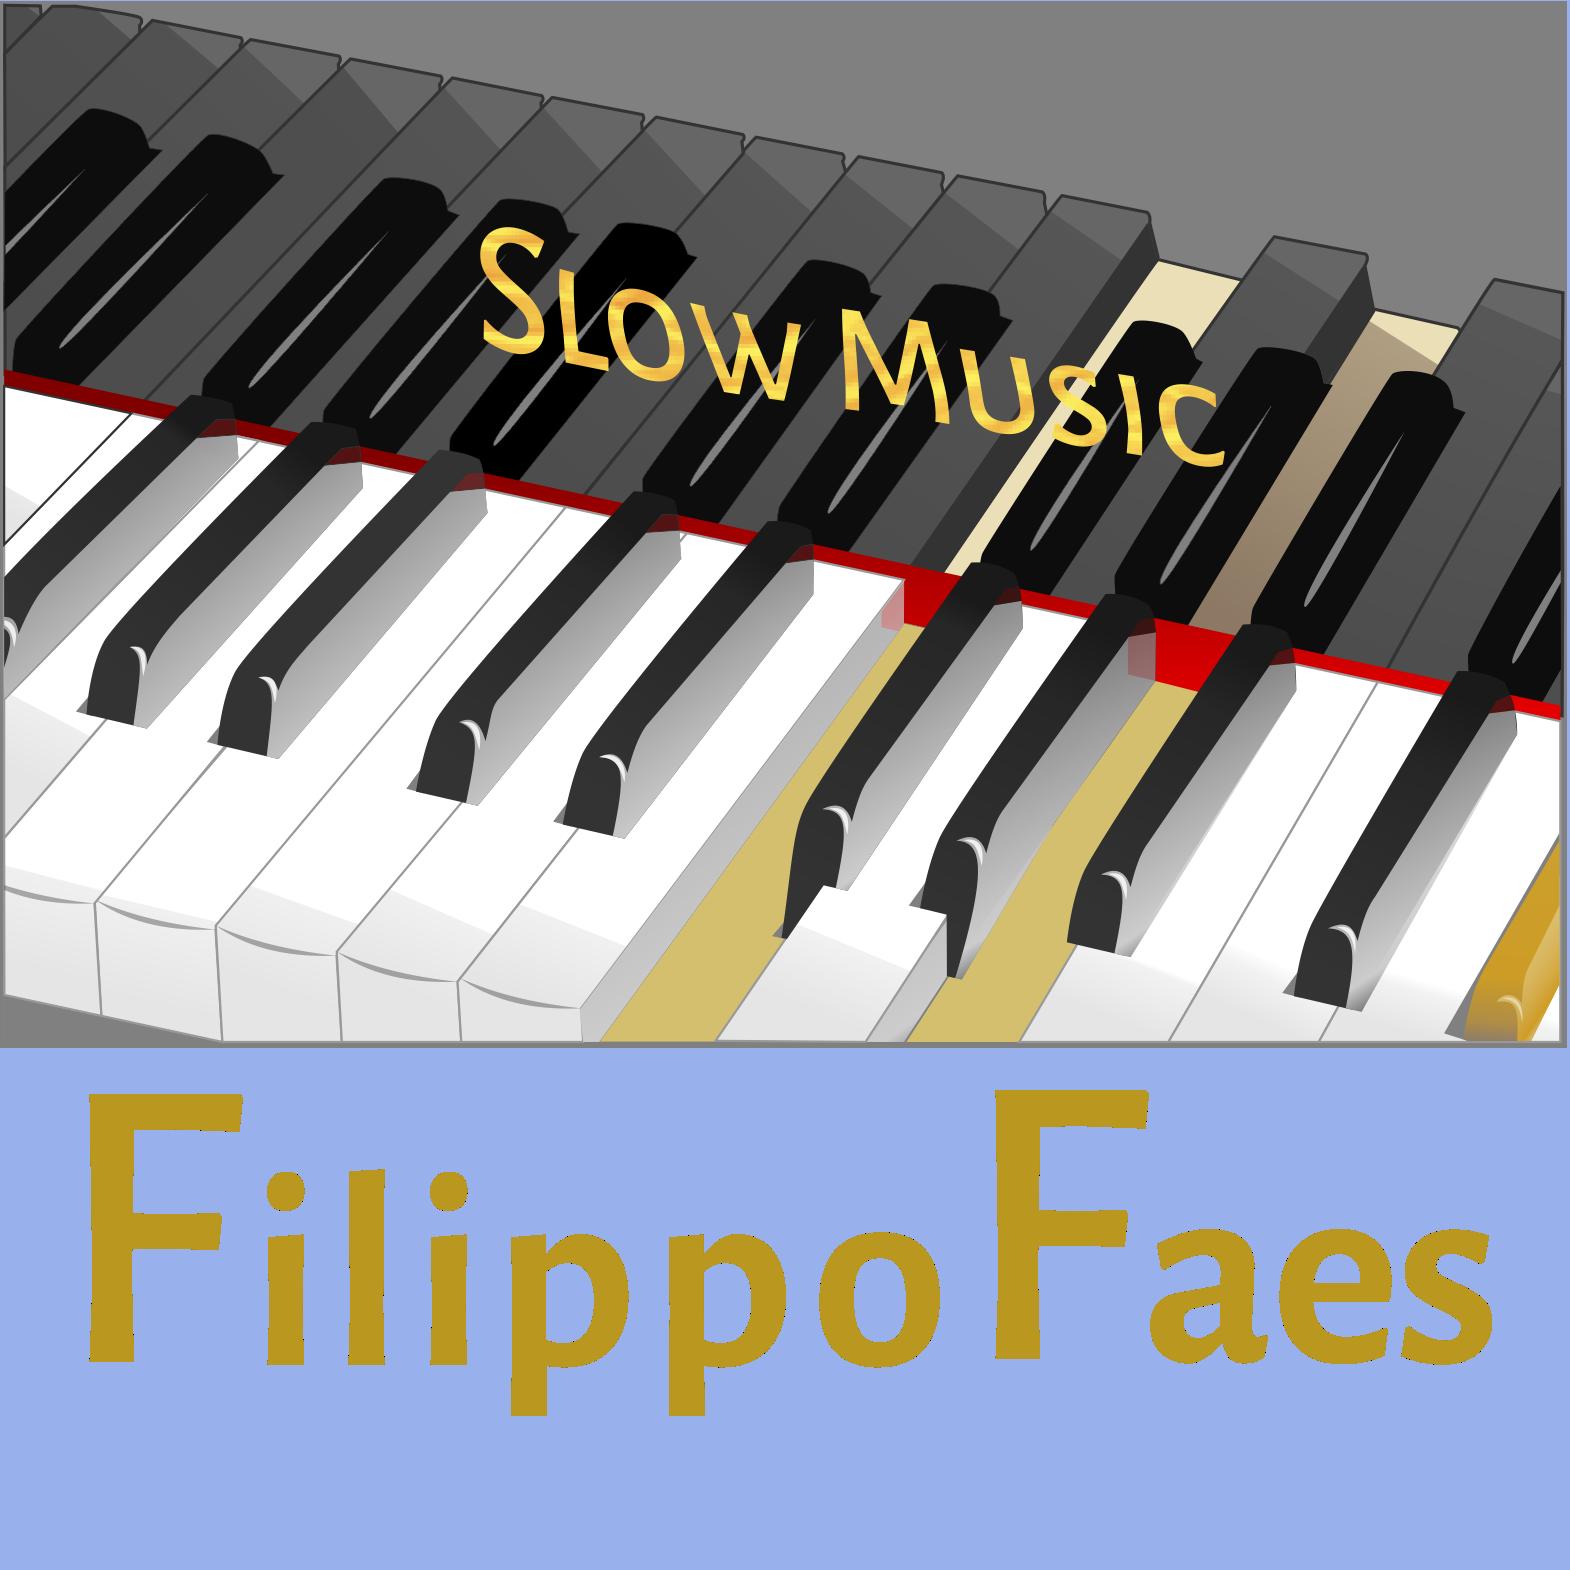 Filippo Faes - Slow Music